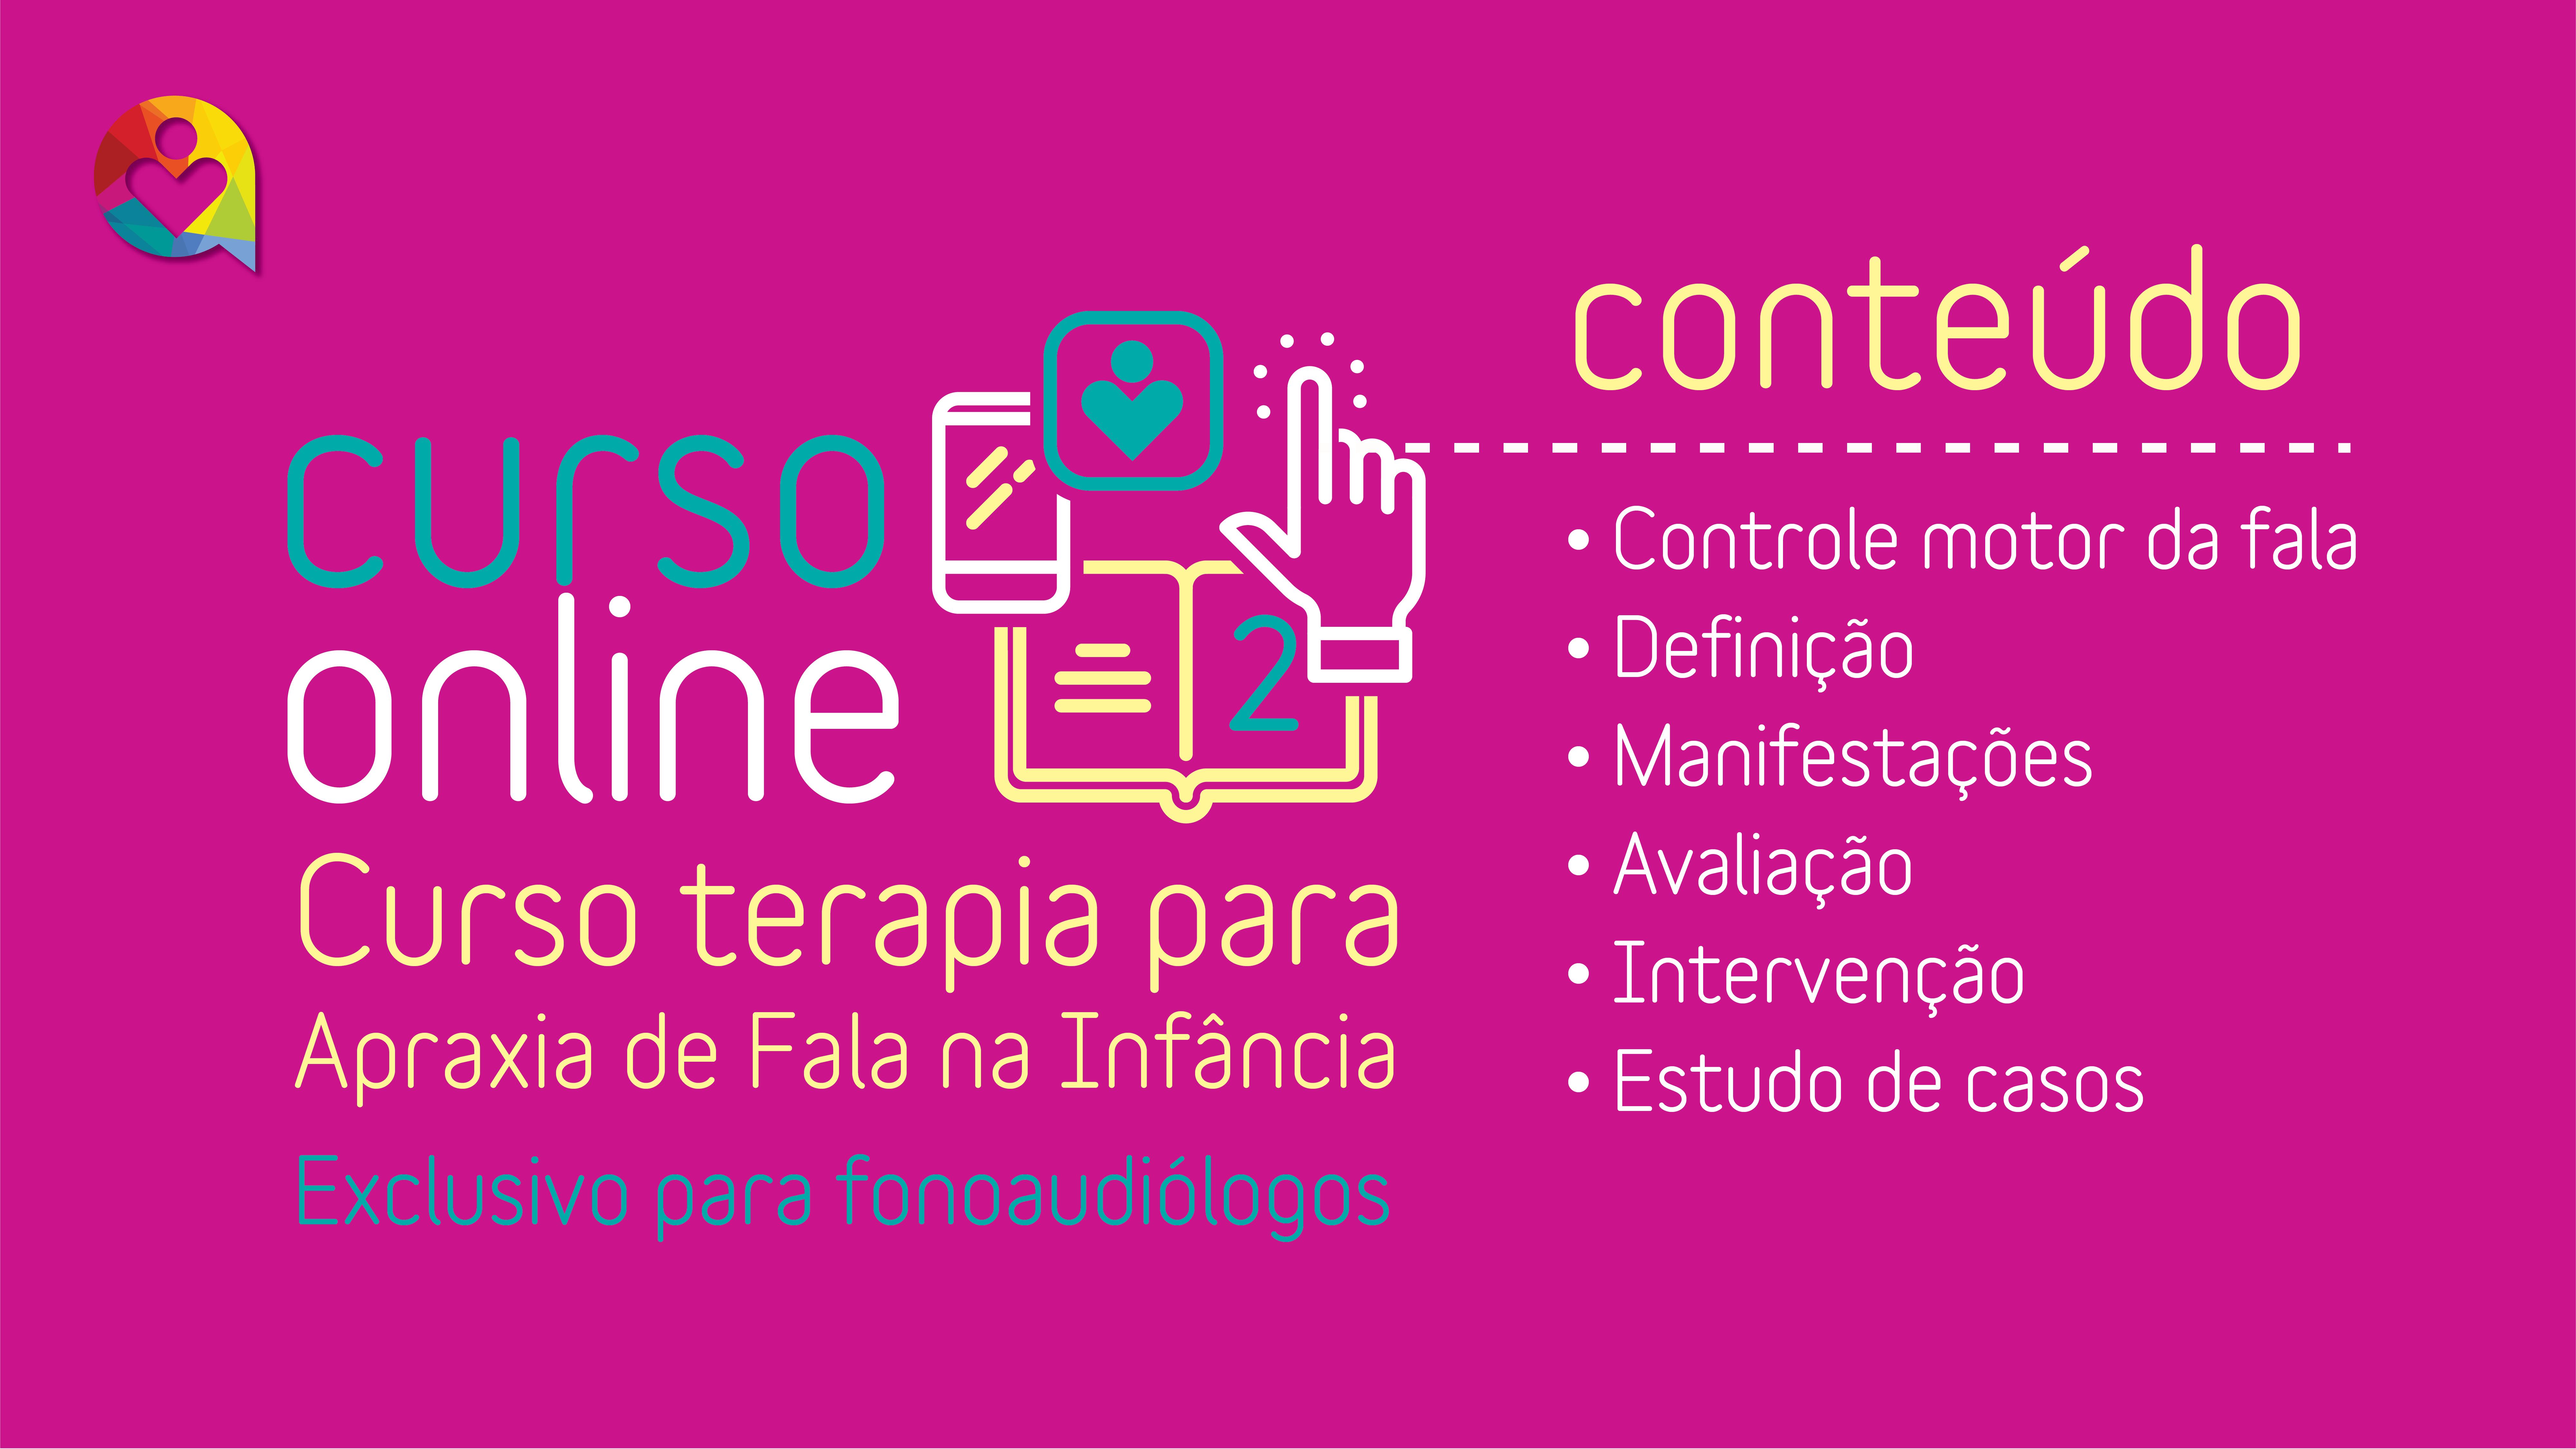 Apraxia lcurso online 2ed 2019 05